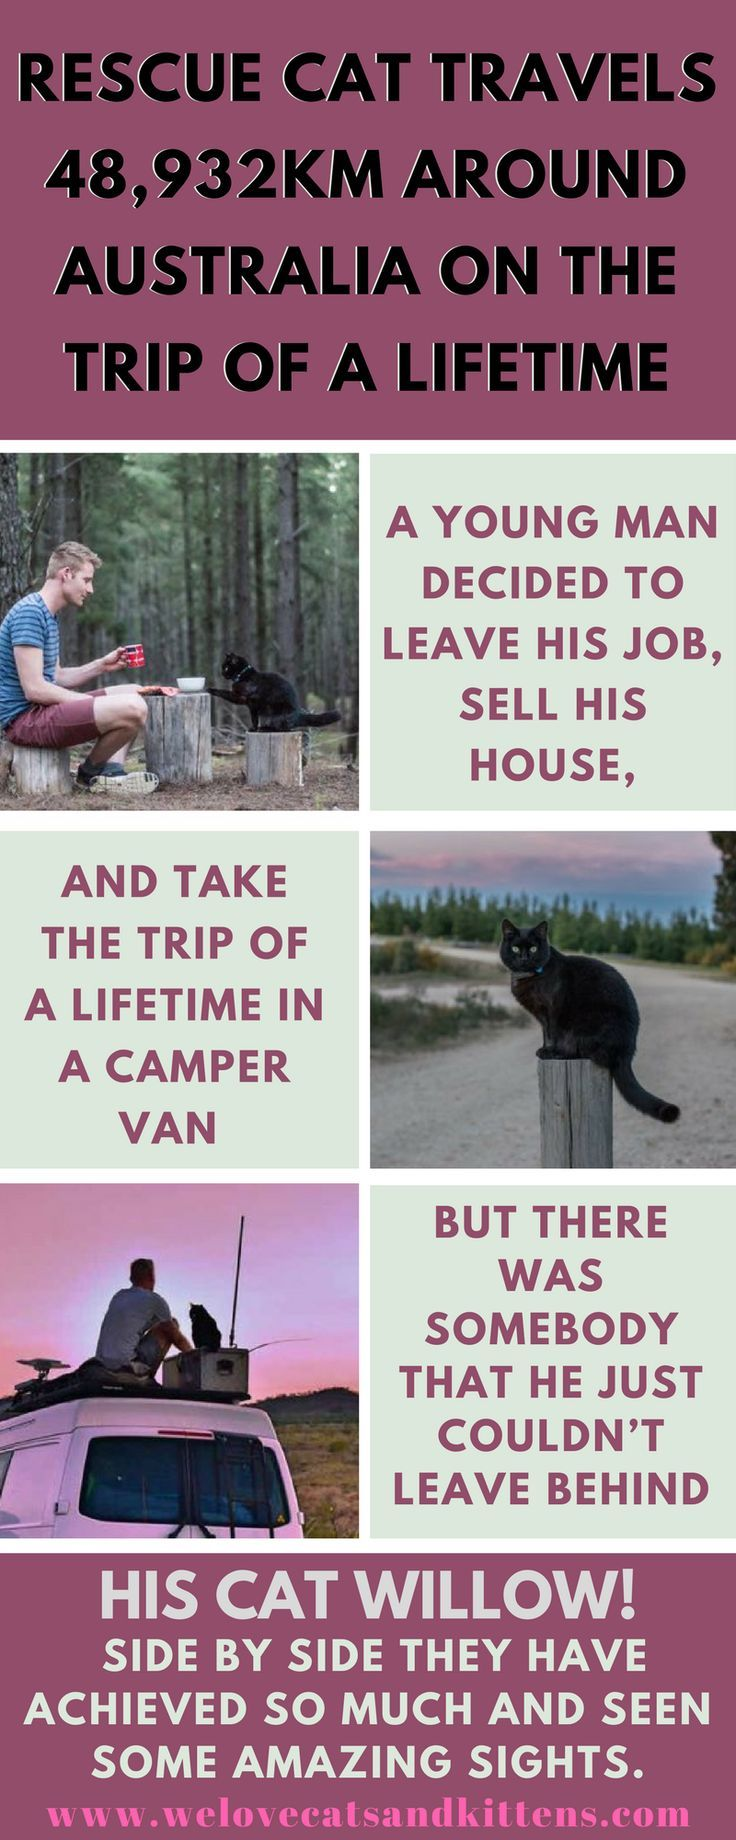 Rescue Cat Travels 48 932km Around Australia On The Trip Of A Lifetime Van Life Van Life Blog Cats Kittens